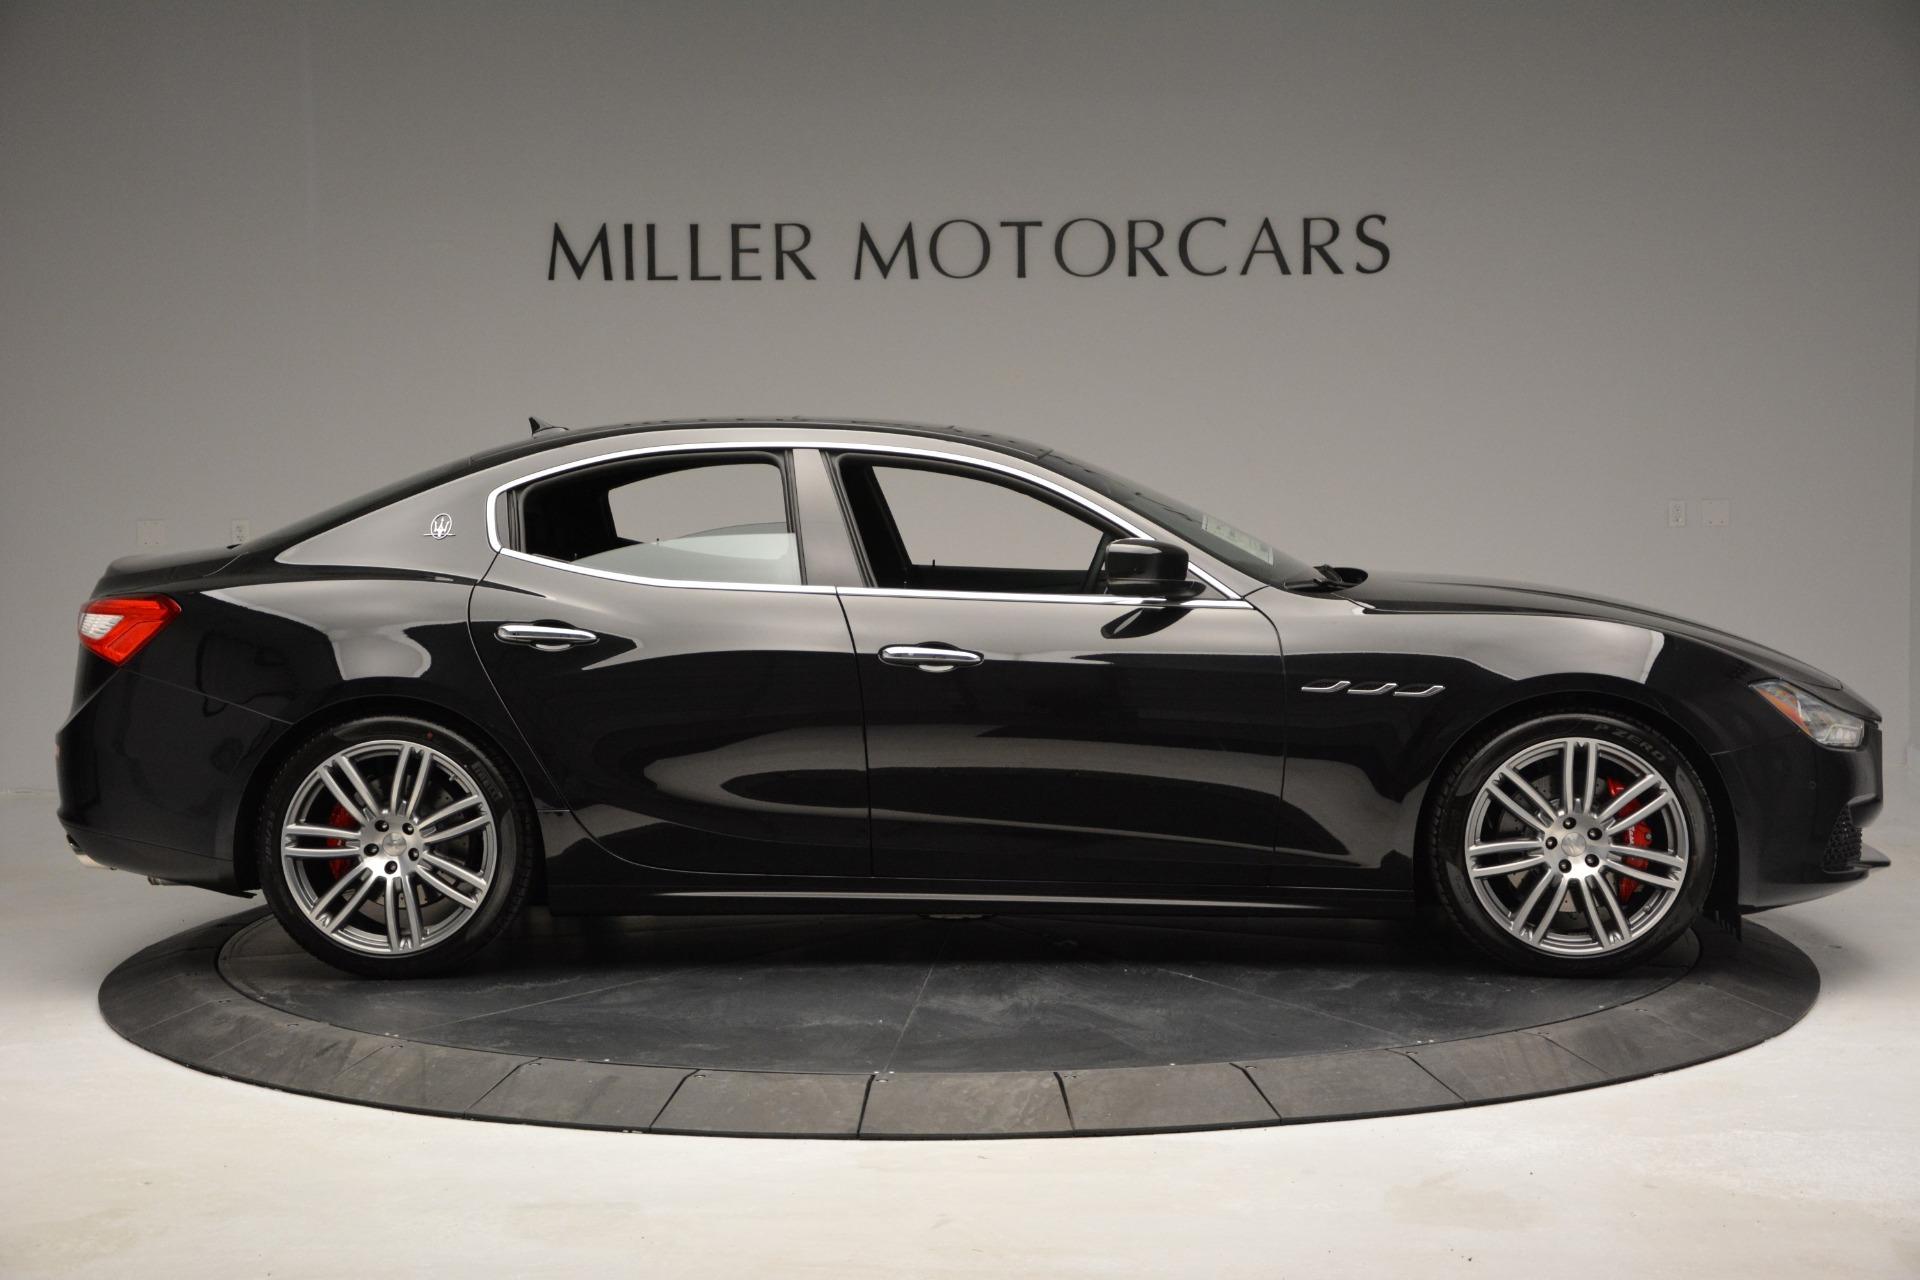 Used 2015 Maserati Ghibli S Q4 For Sale In Greenwich, CT 2070_p9